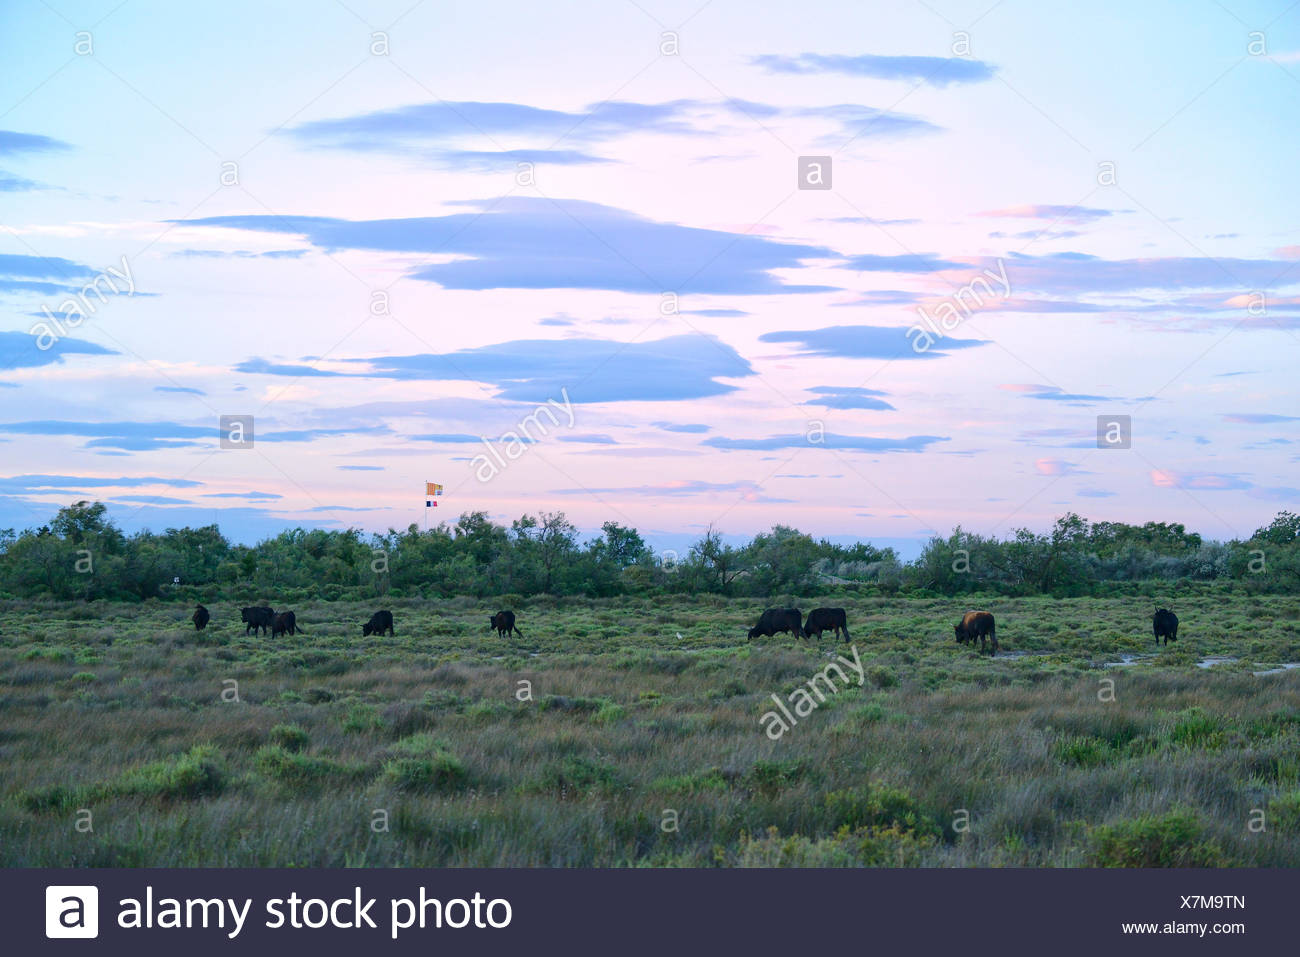 Europe, France, Languedoc- Roussillon, Camargue, bulls, cattle, wetland, animals, - Stock Image